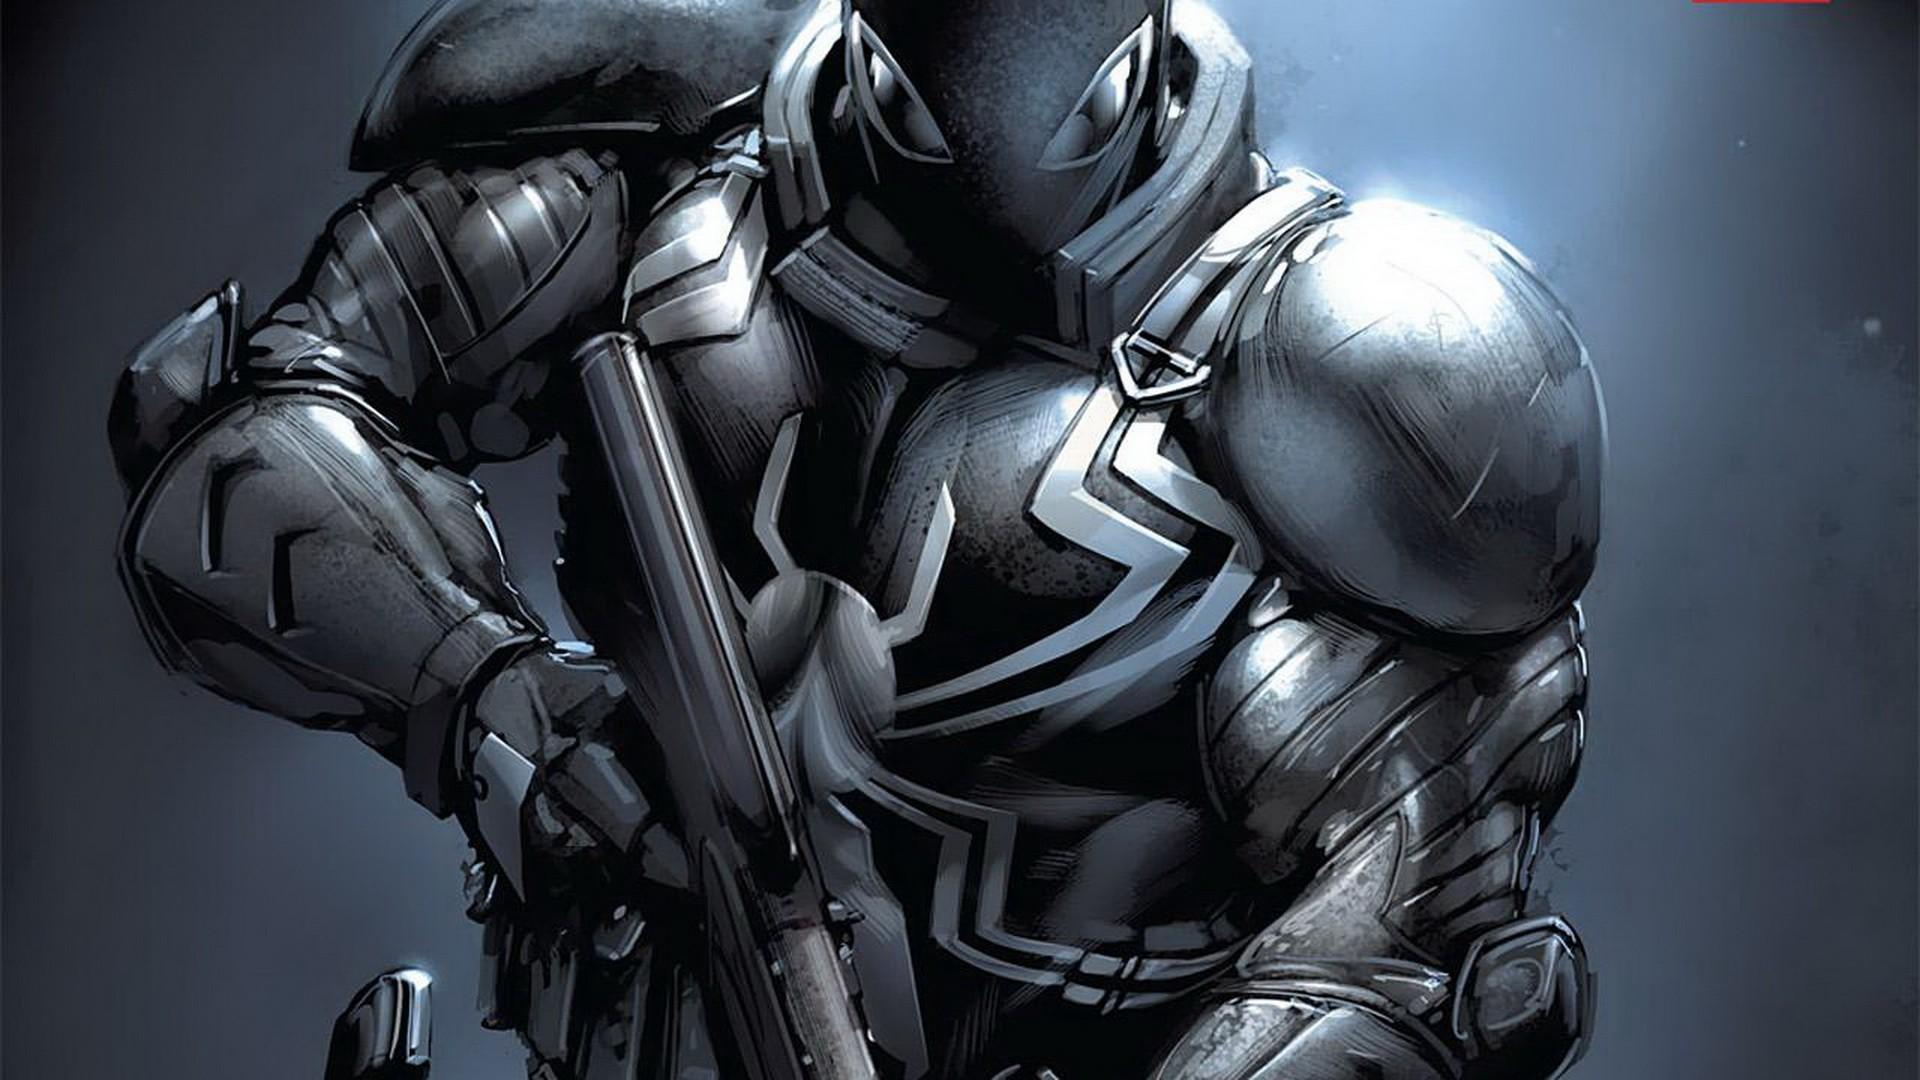 Comics Flash Thompson Marvel Comics Venom free iPhone or Android Full HD  wallpaper.